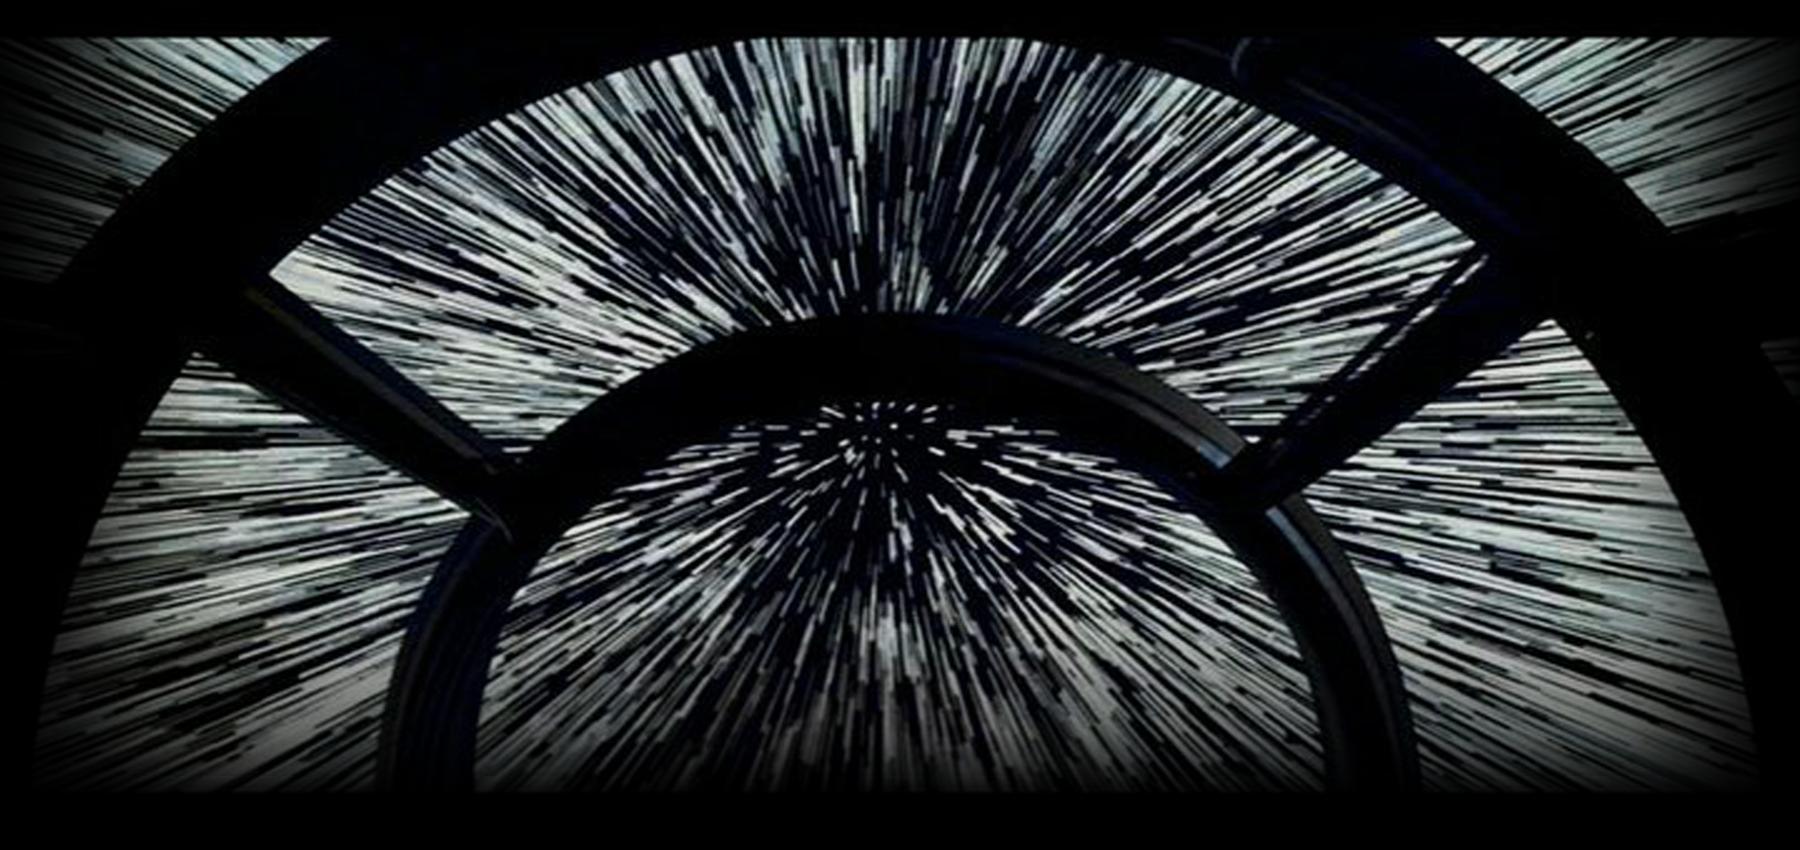 image wiki background png star wars fanpedia fandom powered by